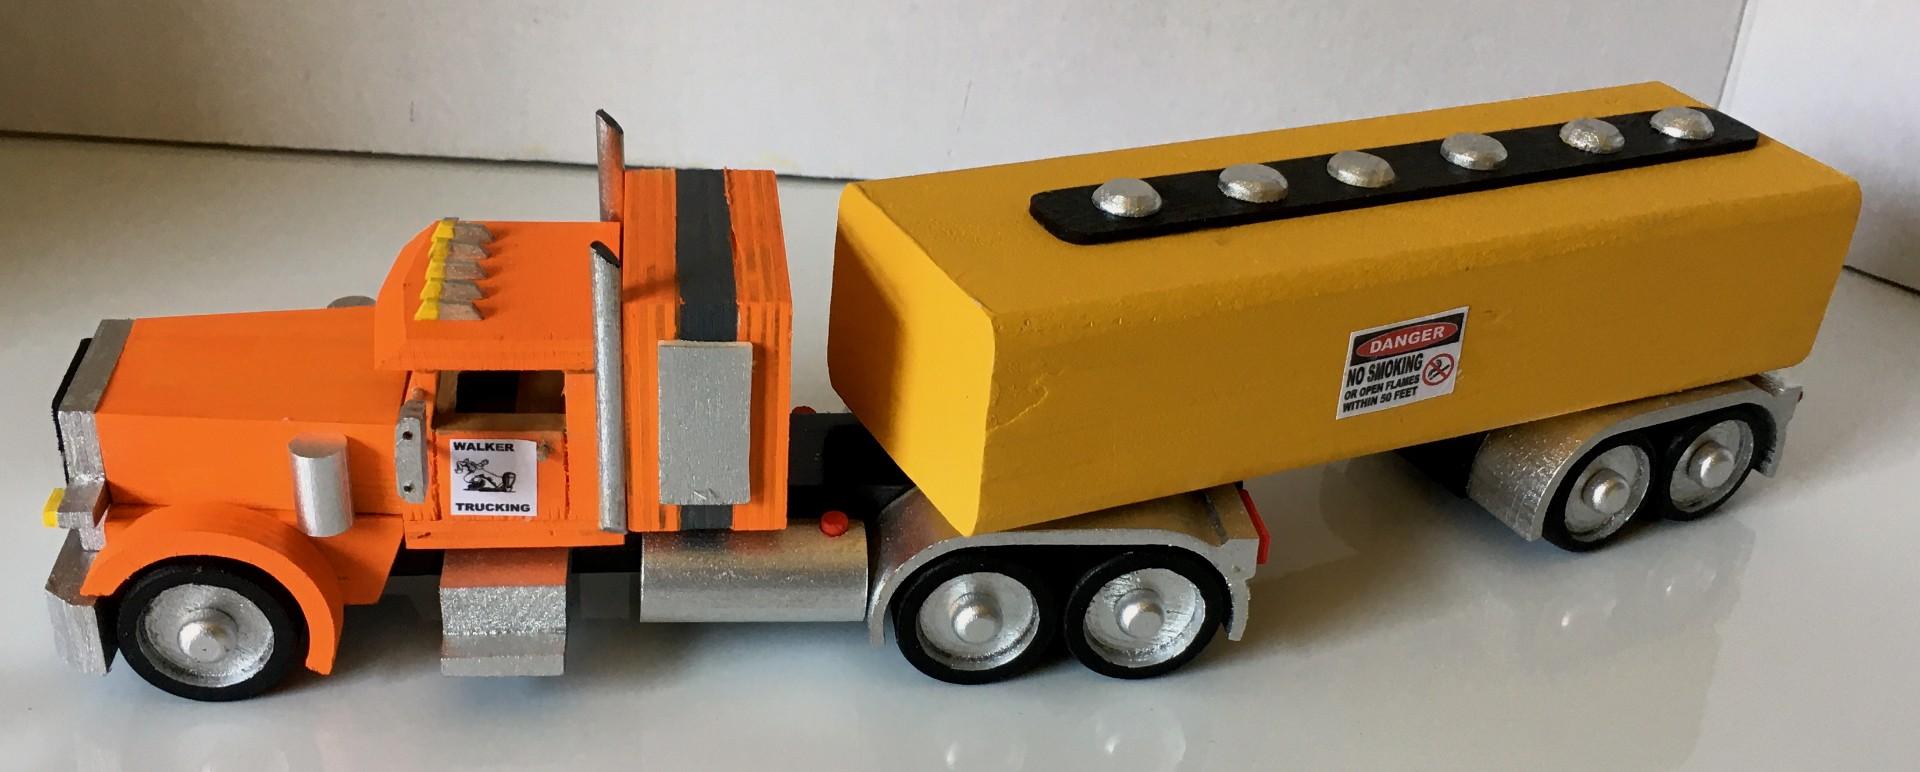 Peterbilt389 Tractor & Tanker Trailer.jpg